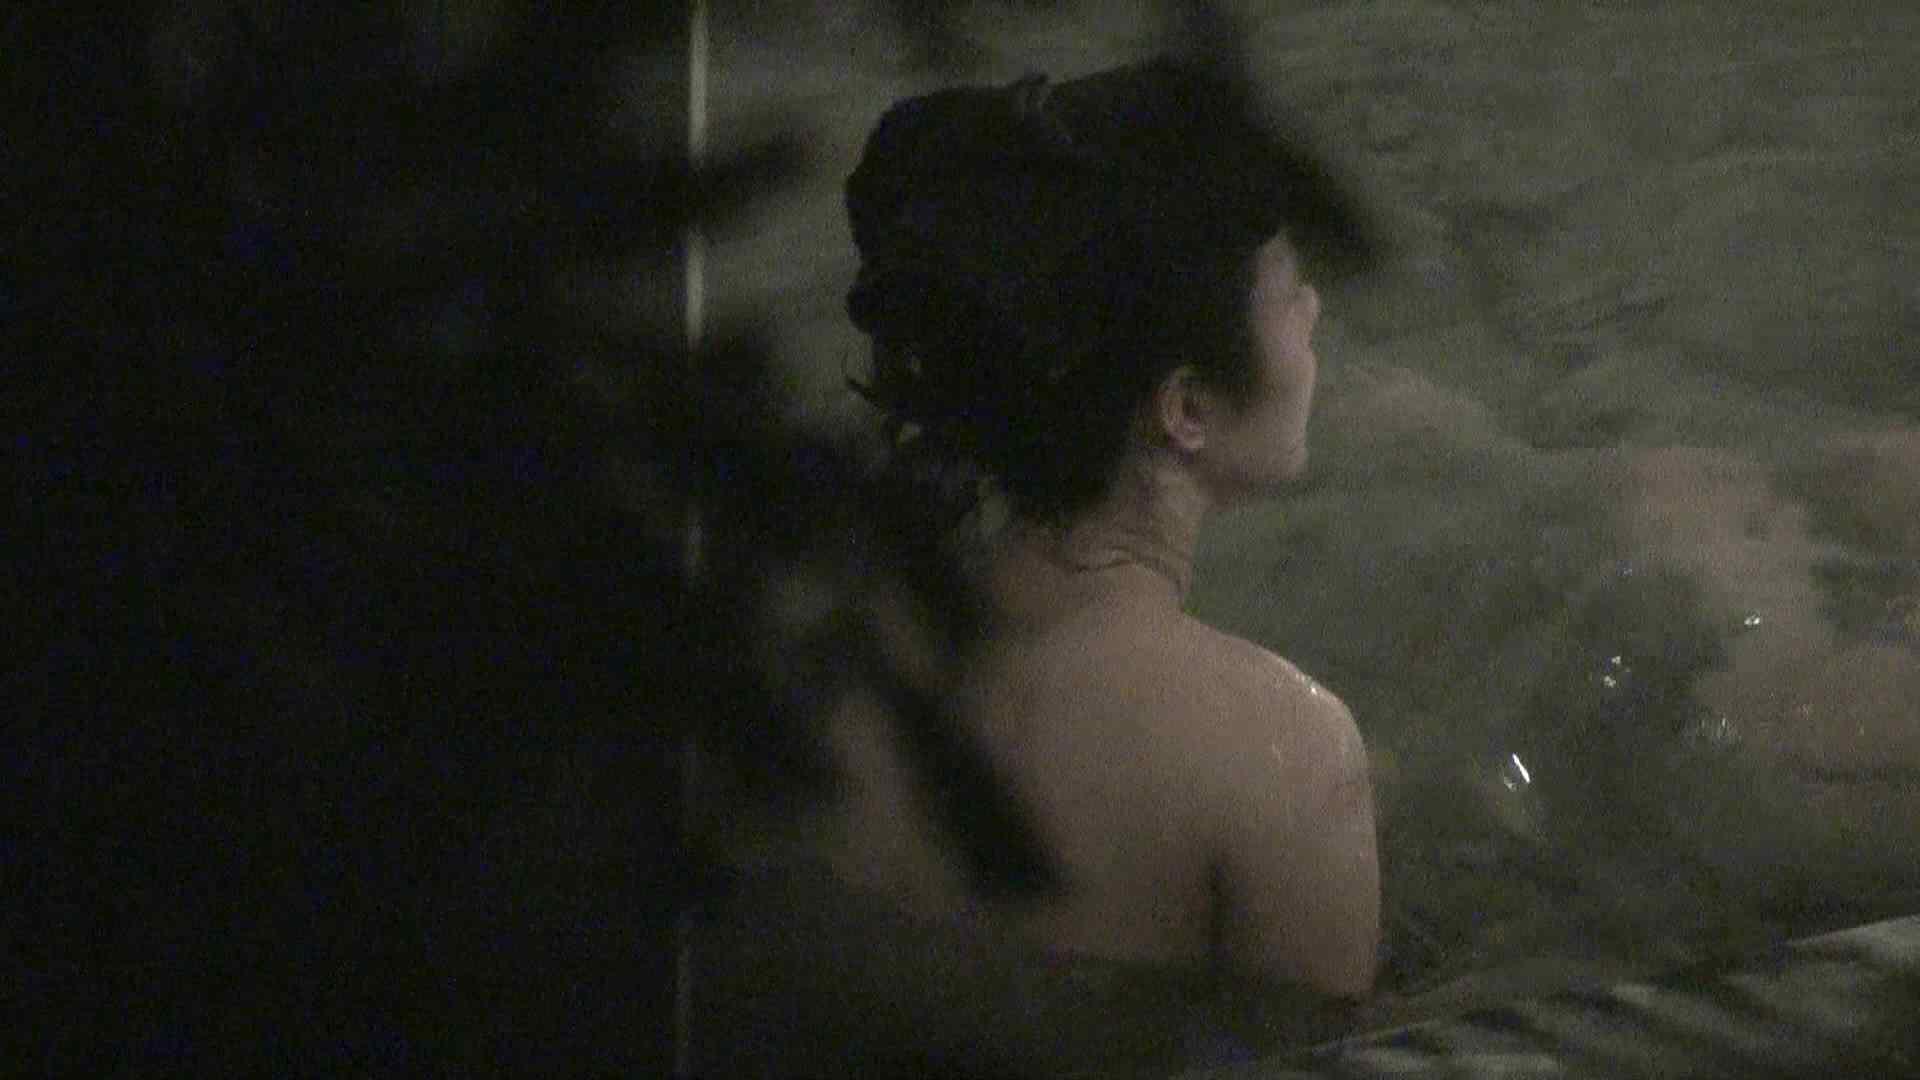 Aquaな露天風呂Vol.315 盗撮 セックス無修正動画無料 72枚 68